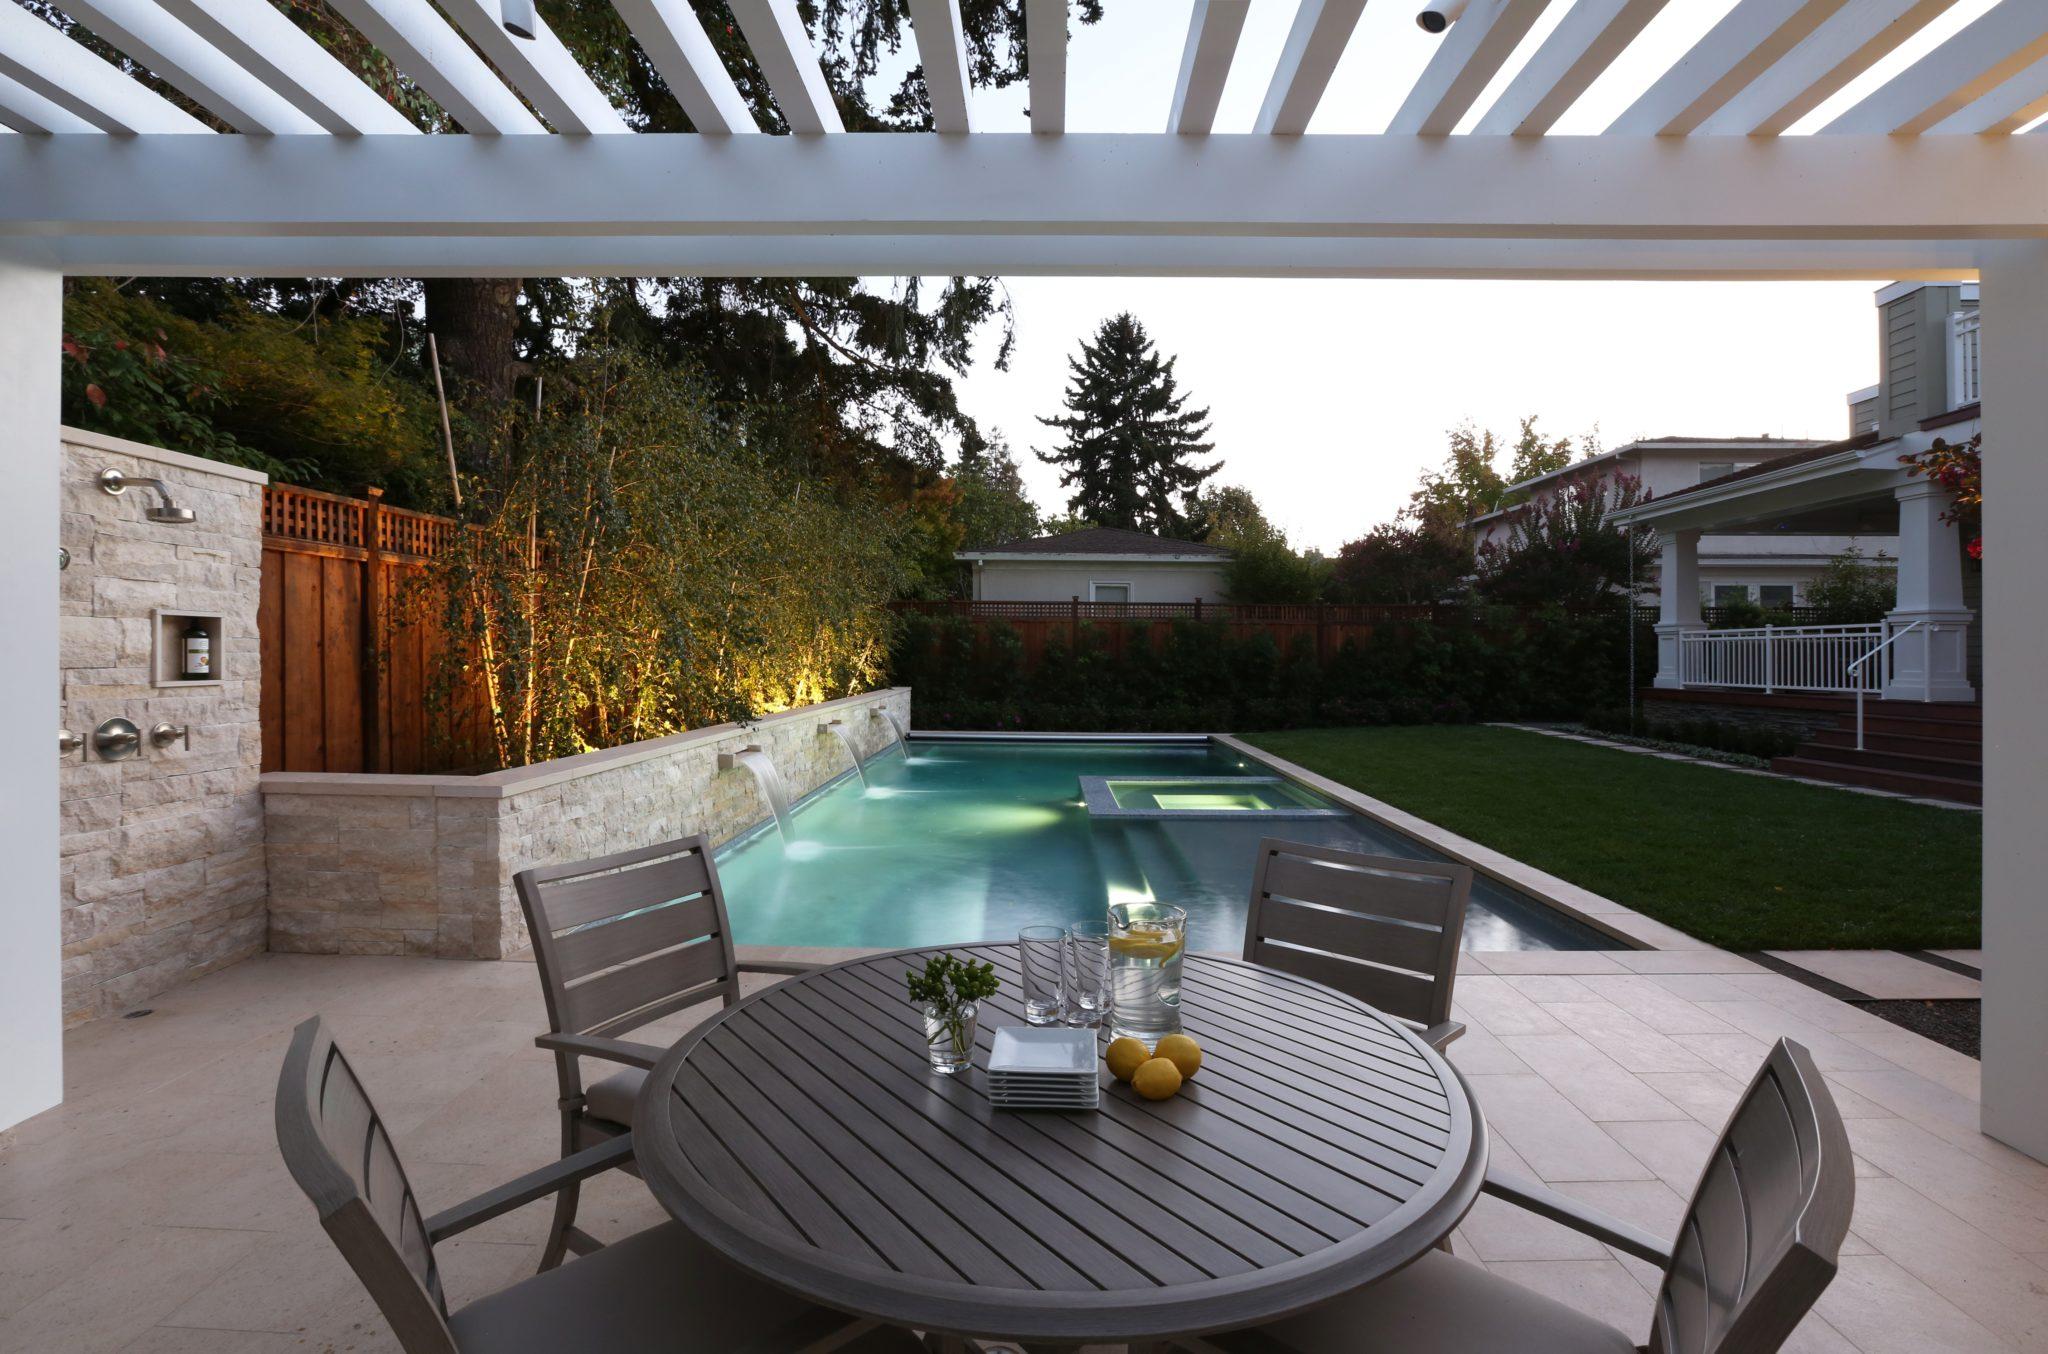 Palo Alto pool andlandscape by Greenblott Design